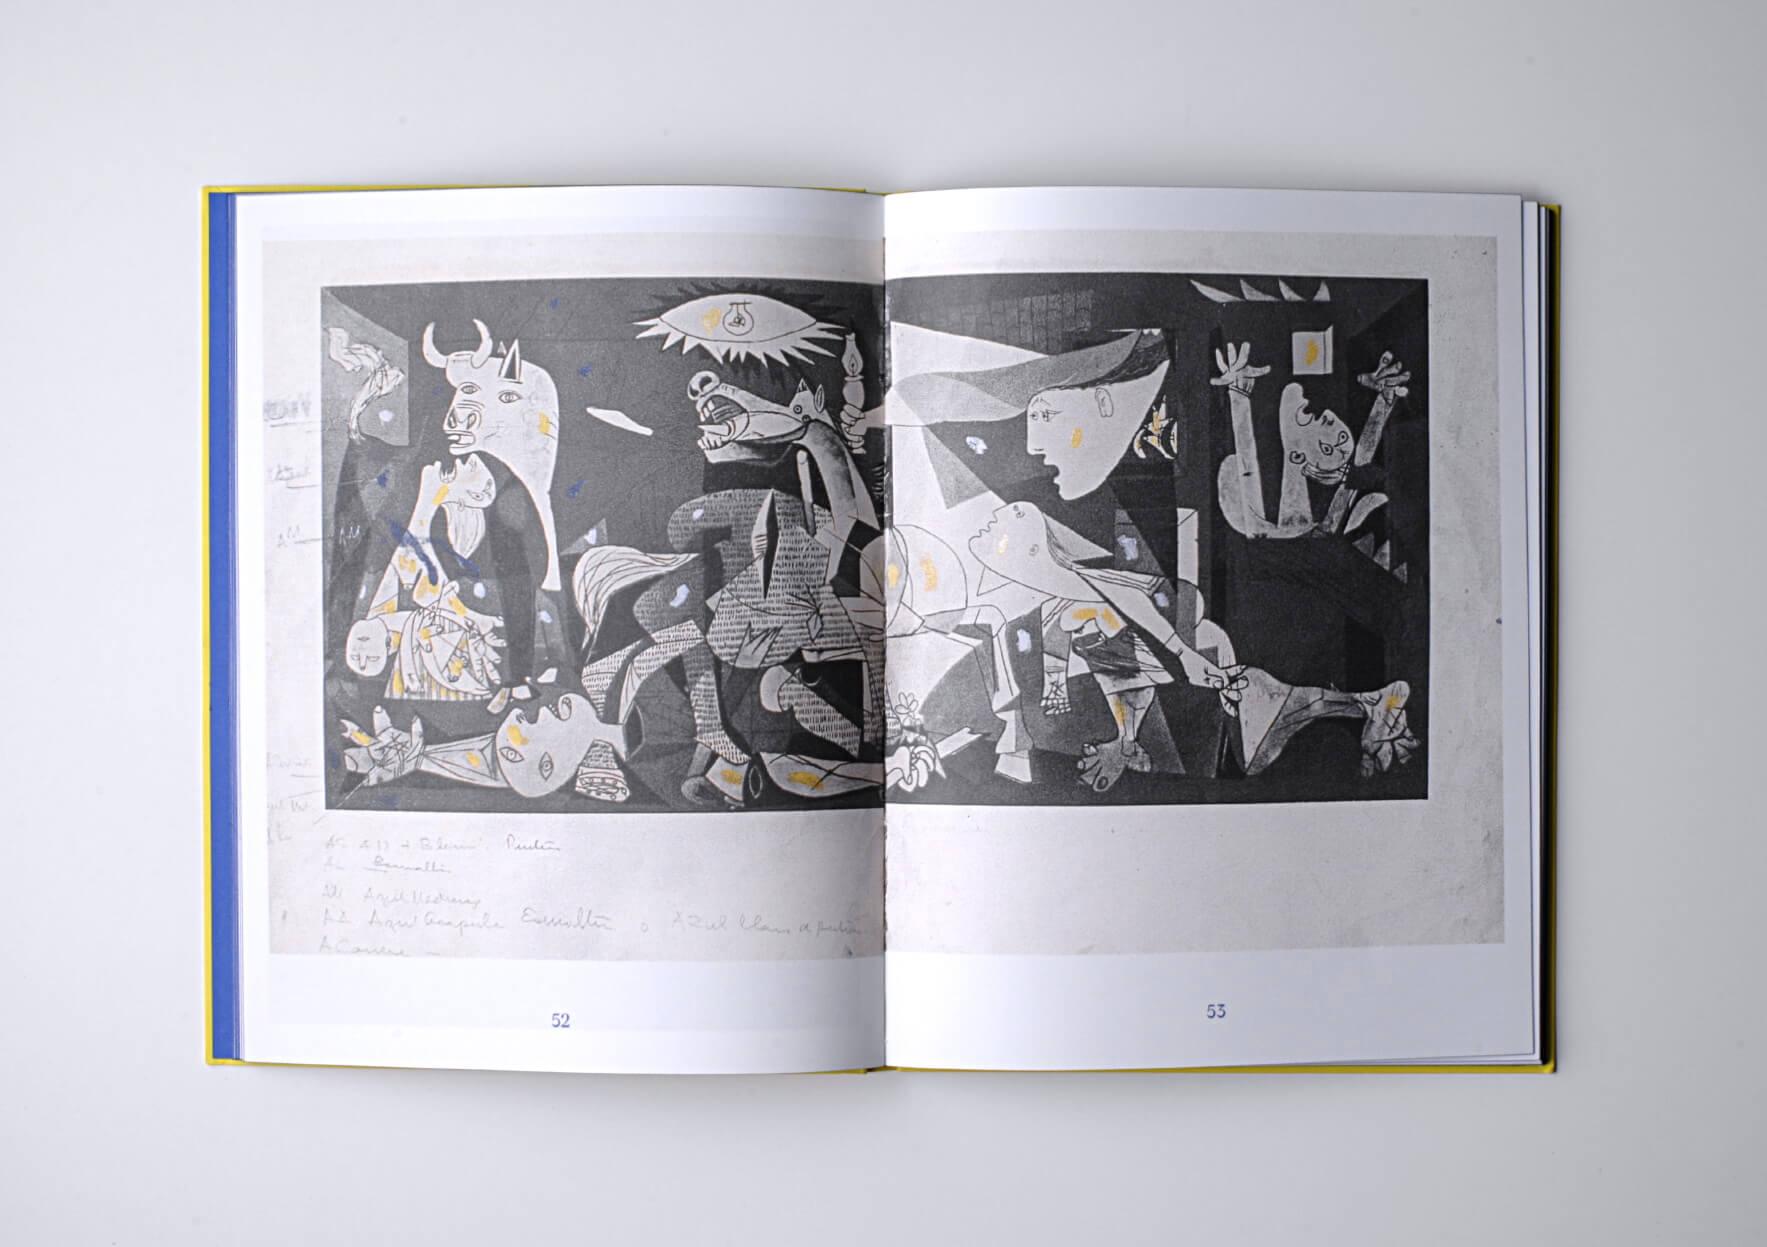 Beatriz González Diario del guernica, 2018 30 x 23 cm, 128 p. 500 ex. Ed. Zulu Press | Mother | ProjecteSD